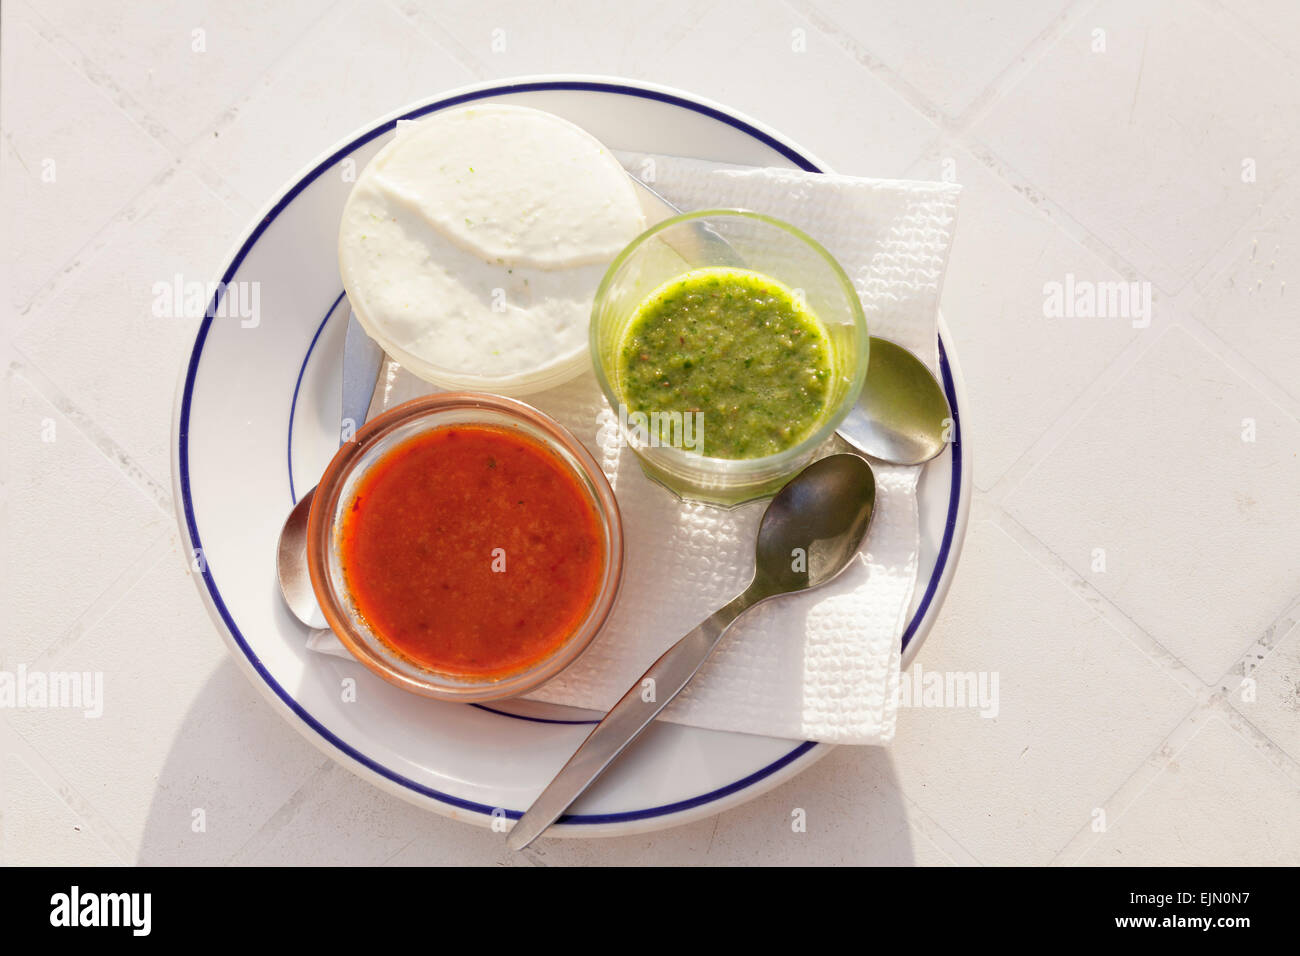 Mojo Rojo, Mojo Verde, rote und grüne Sauce und Mojo de Queso, weiße Frischkäse, La Gomera, Kanarische Stockbild